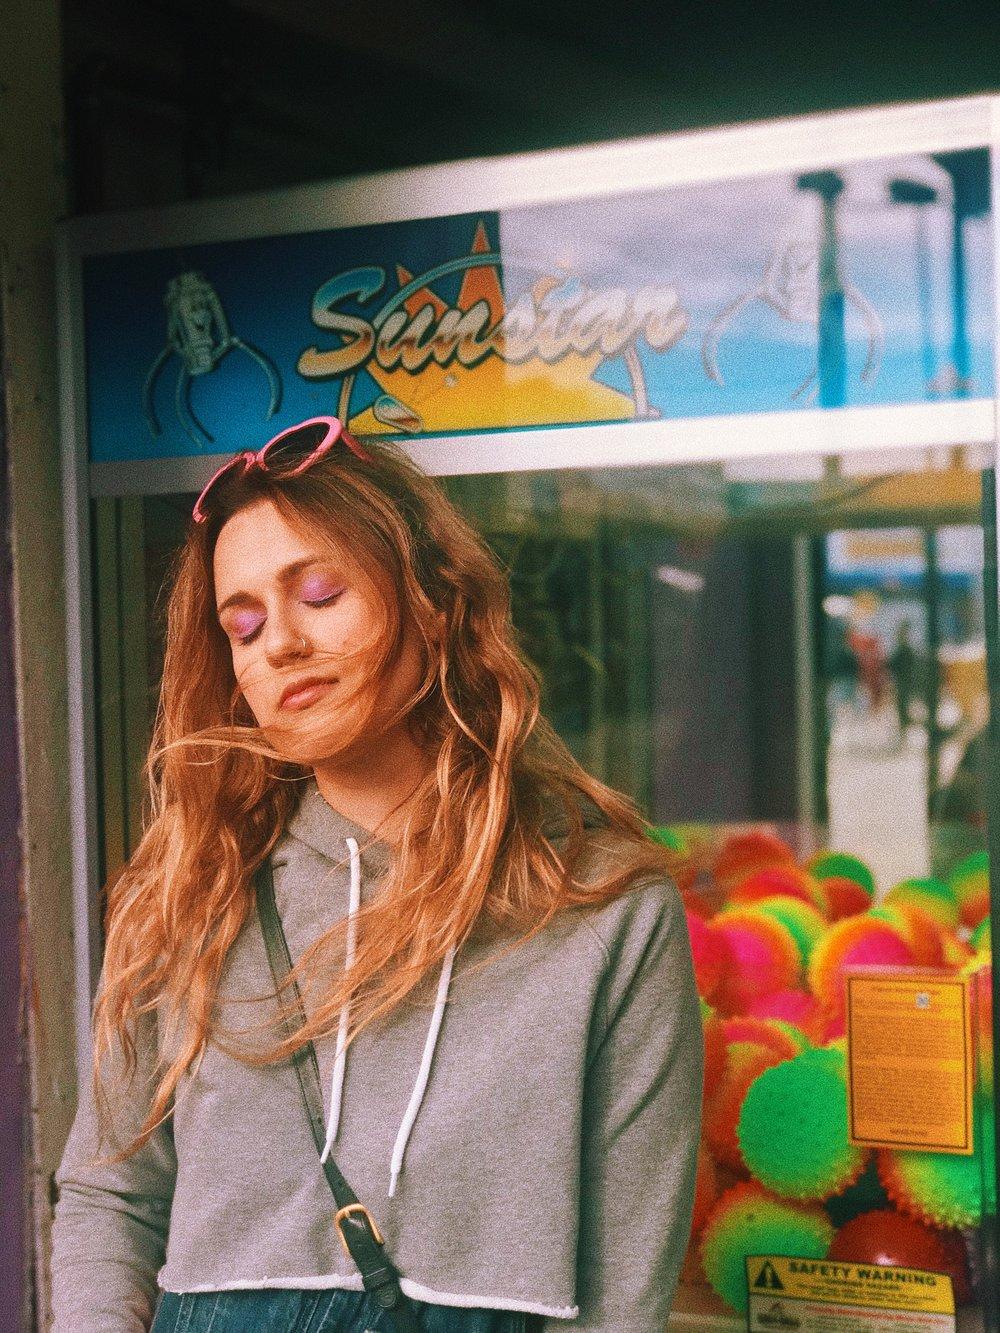 Kat Coney Island Wind